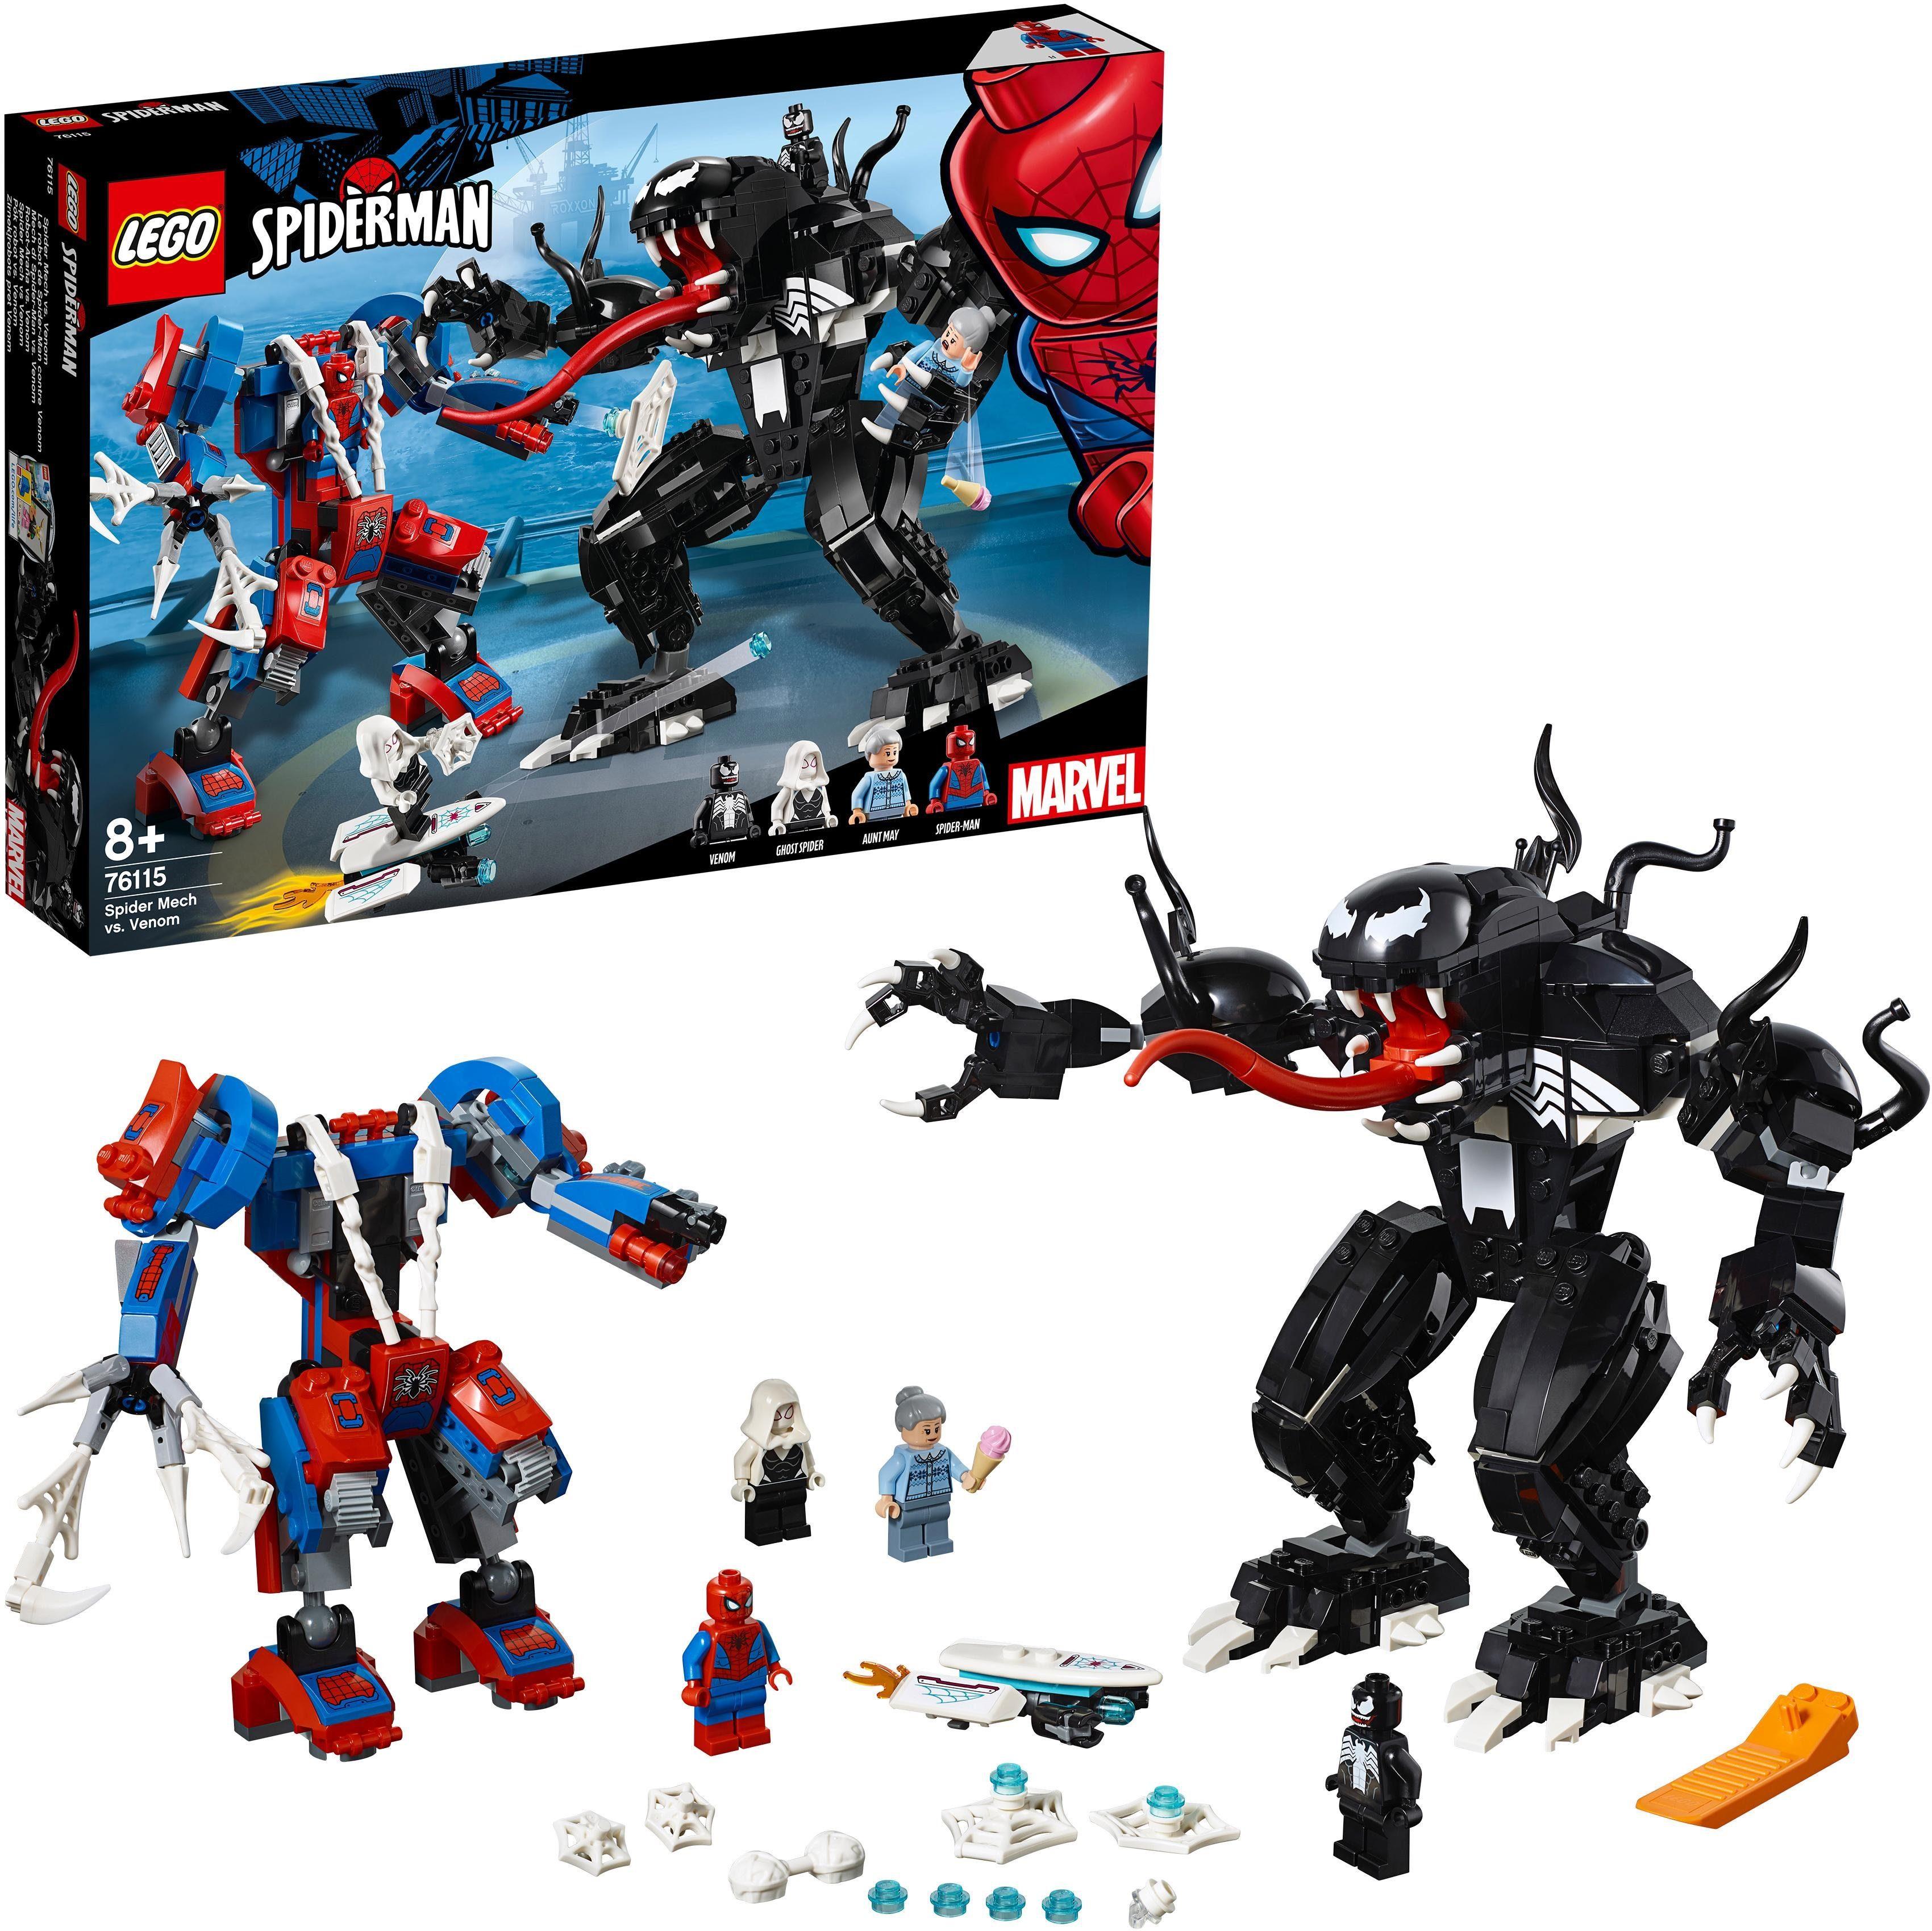 LEGO® Konstruktionsspielsteine »Spider Mech vs. Venom (76115), LEGO® Marvel Super Heroes™«, (604 tlg)